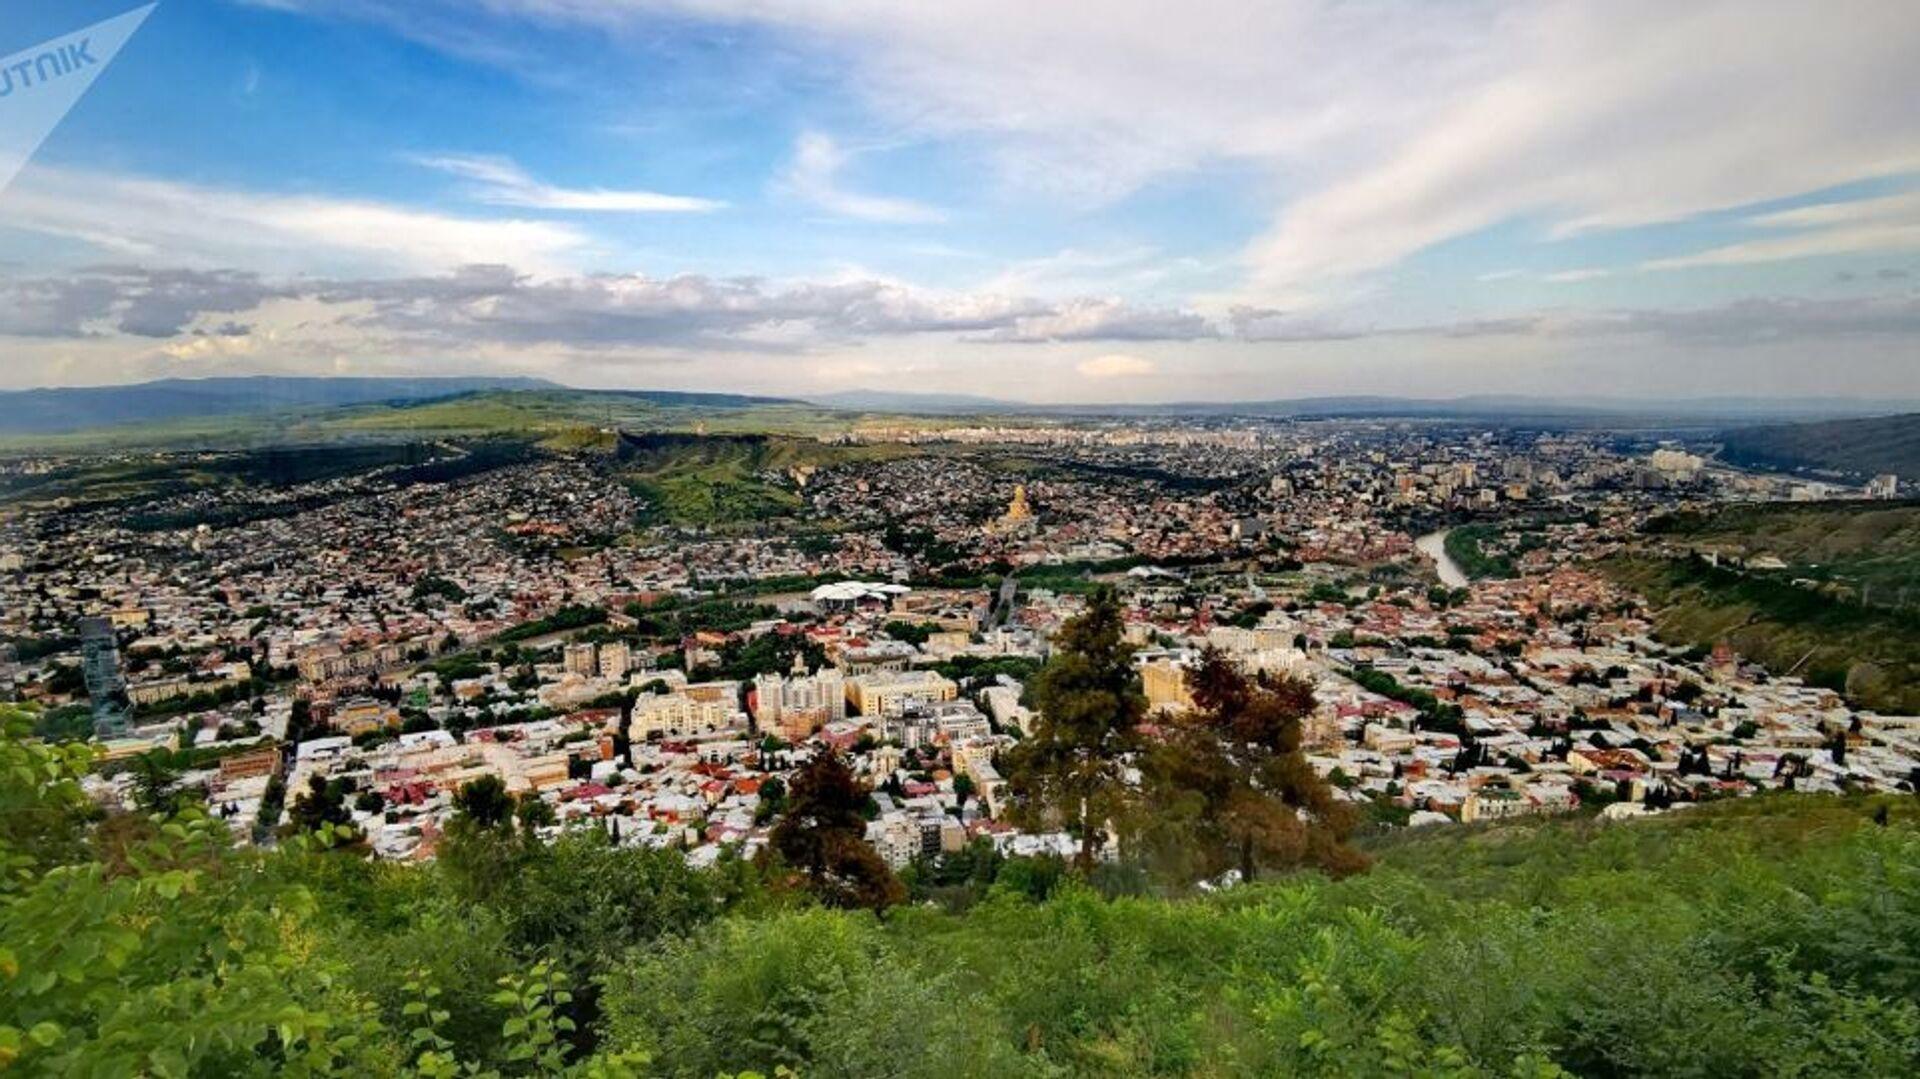 Вид на город Тбилиси - Sputnik Azərbaycan, 1920, 27.09.2021